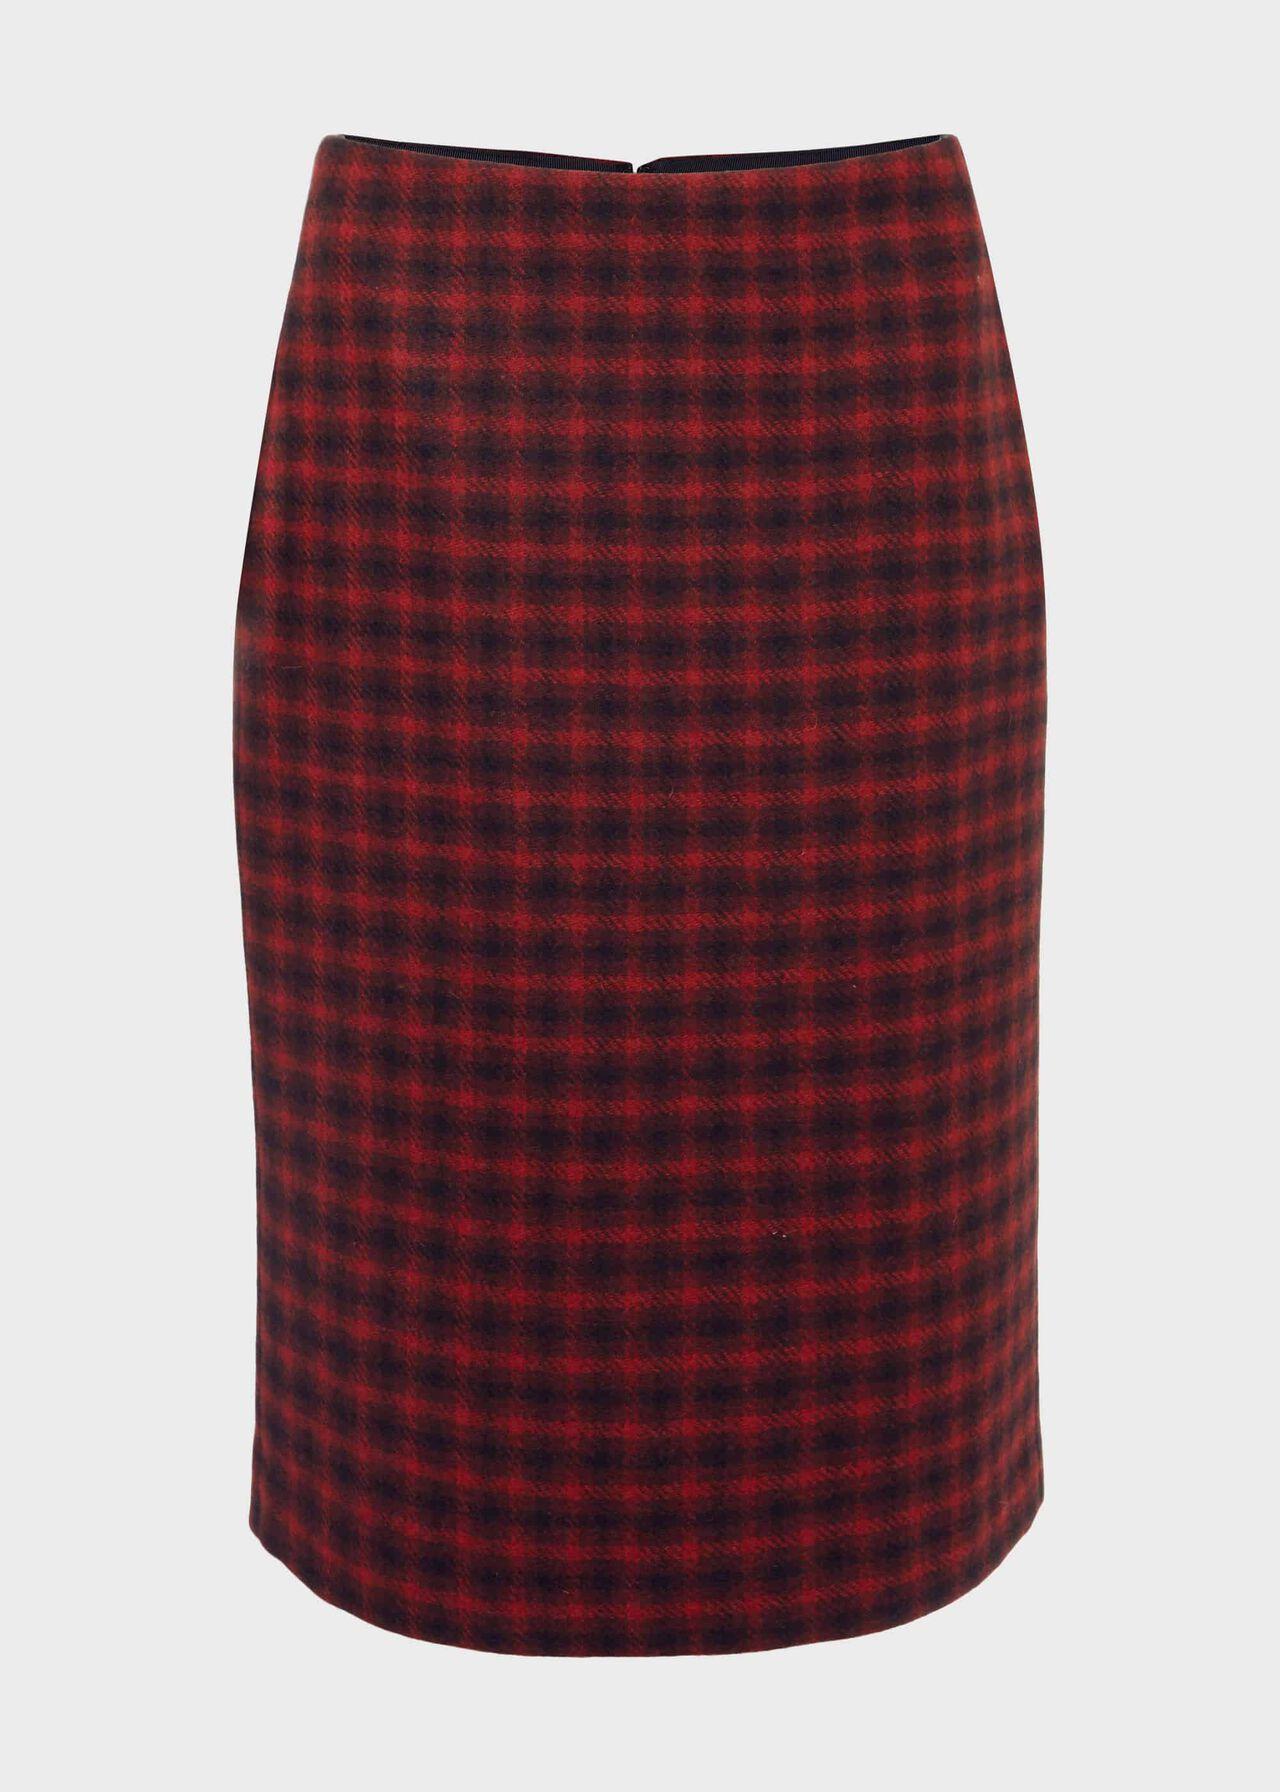 Daphne Wool Pencil Skirt Red Black